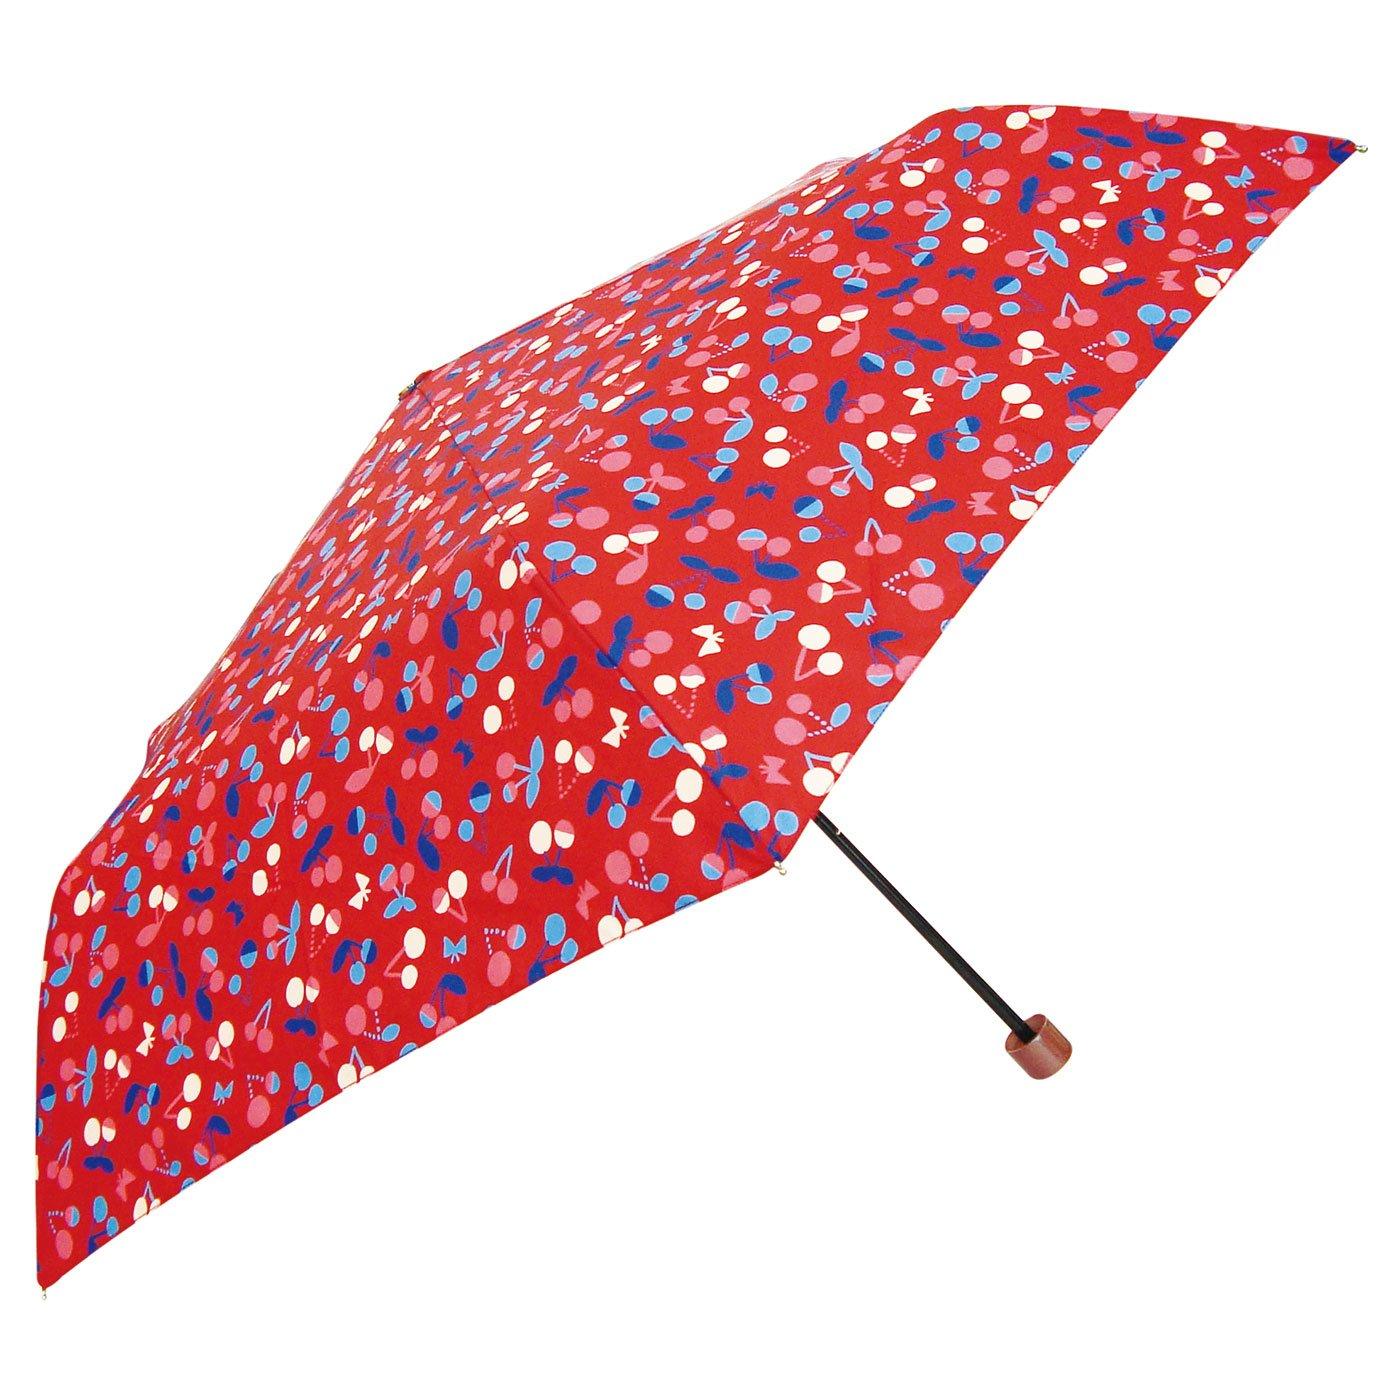 Shizuku L 折りたたみ傘 晴雨兼用 (チェリー)